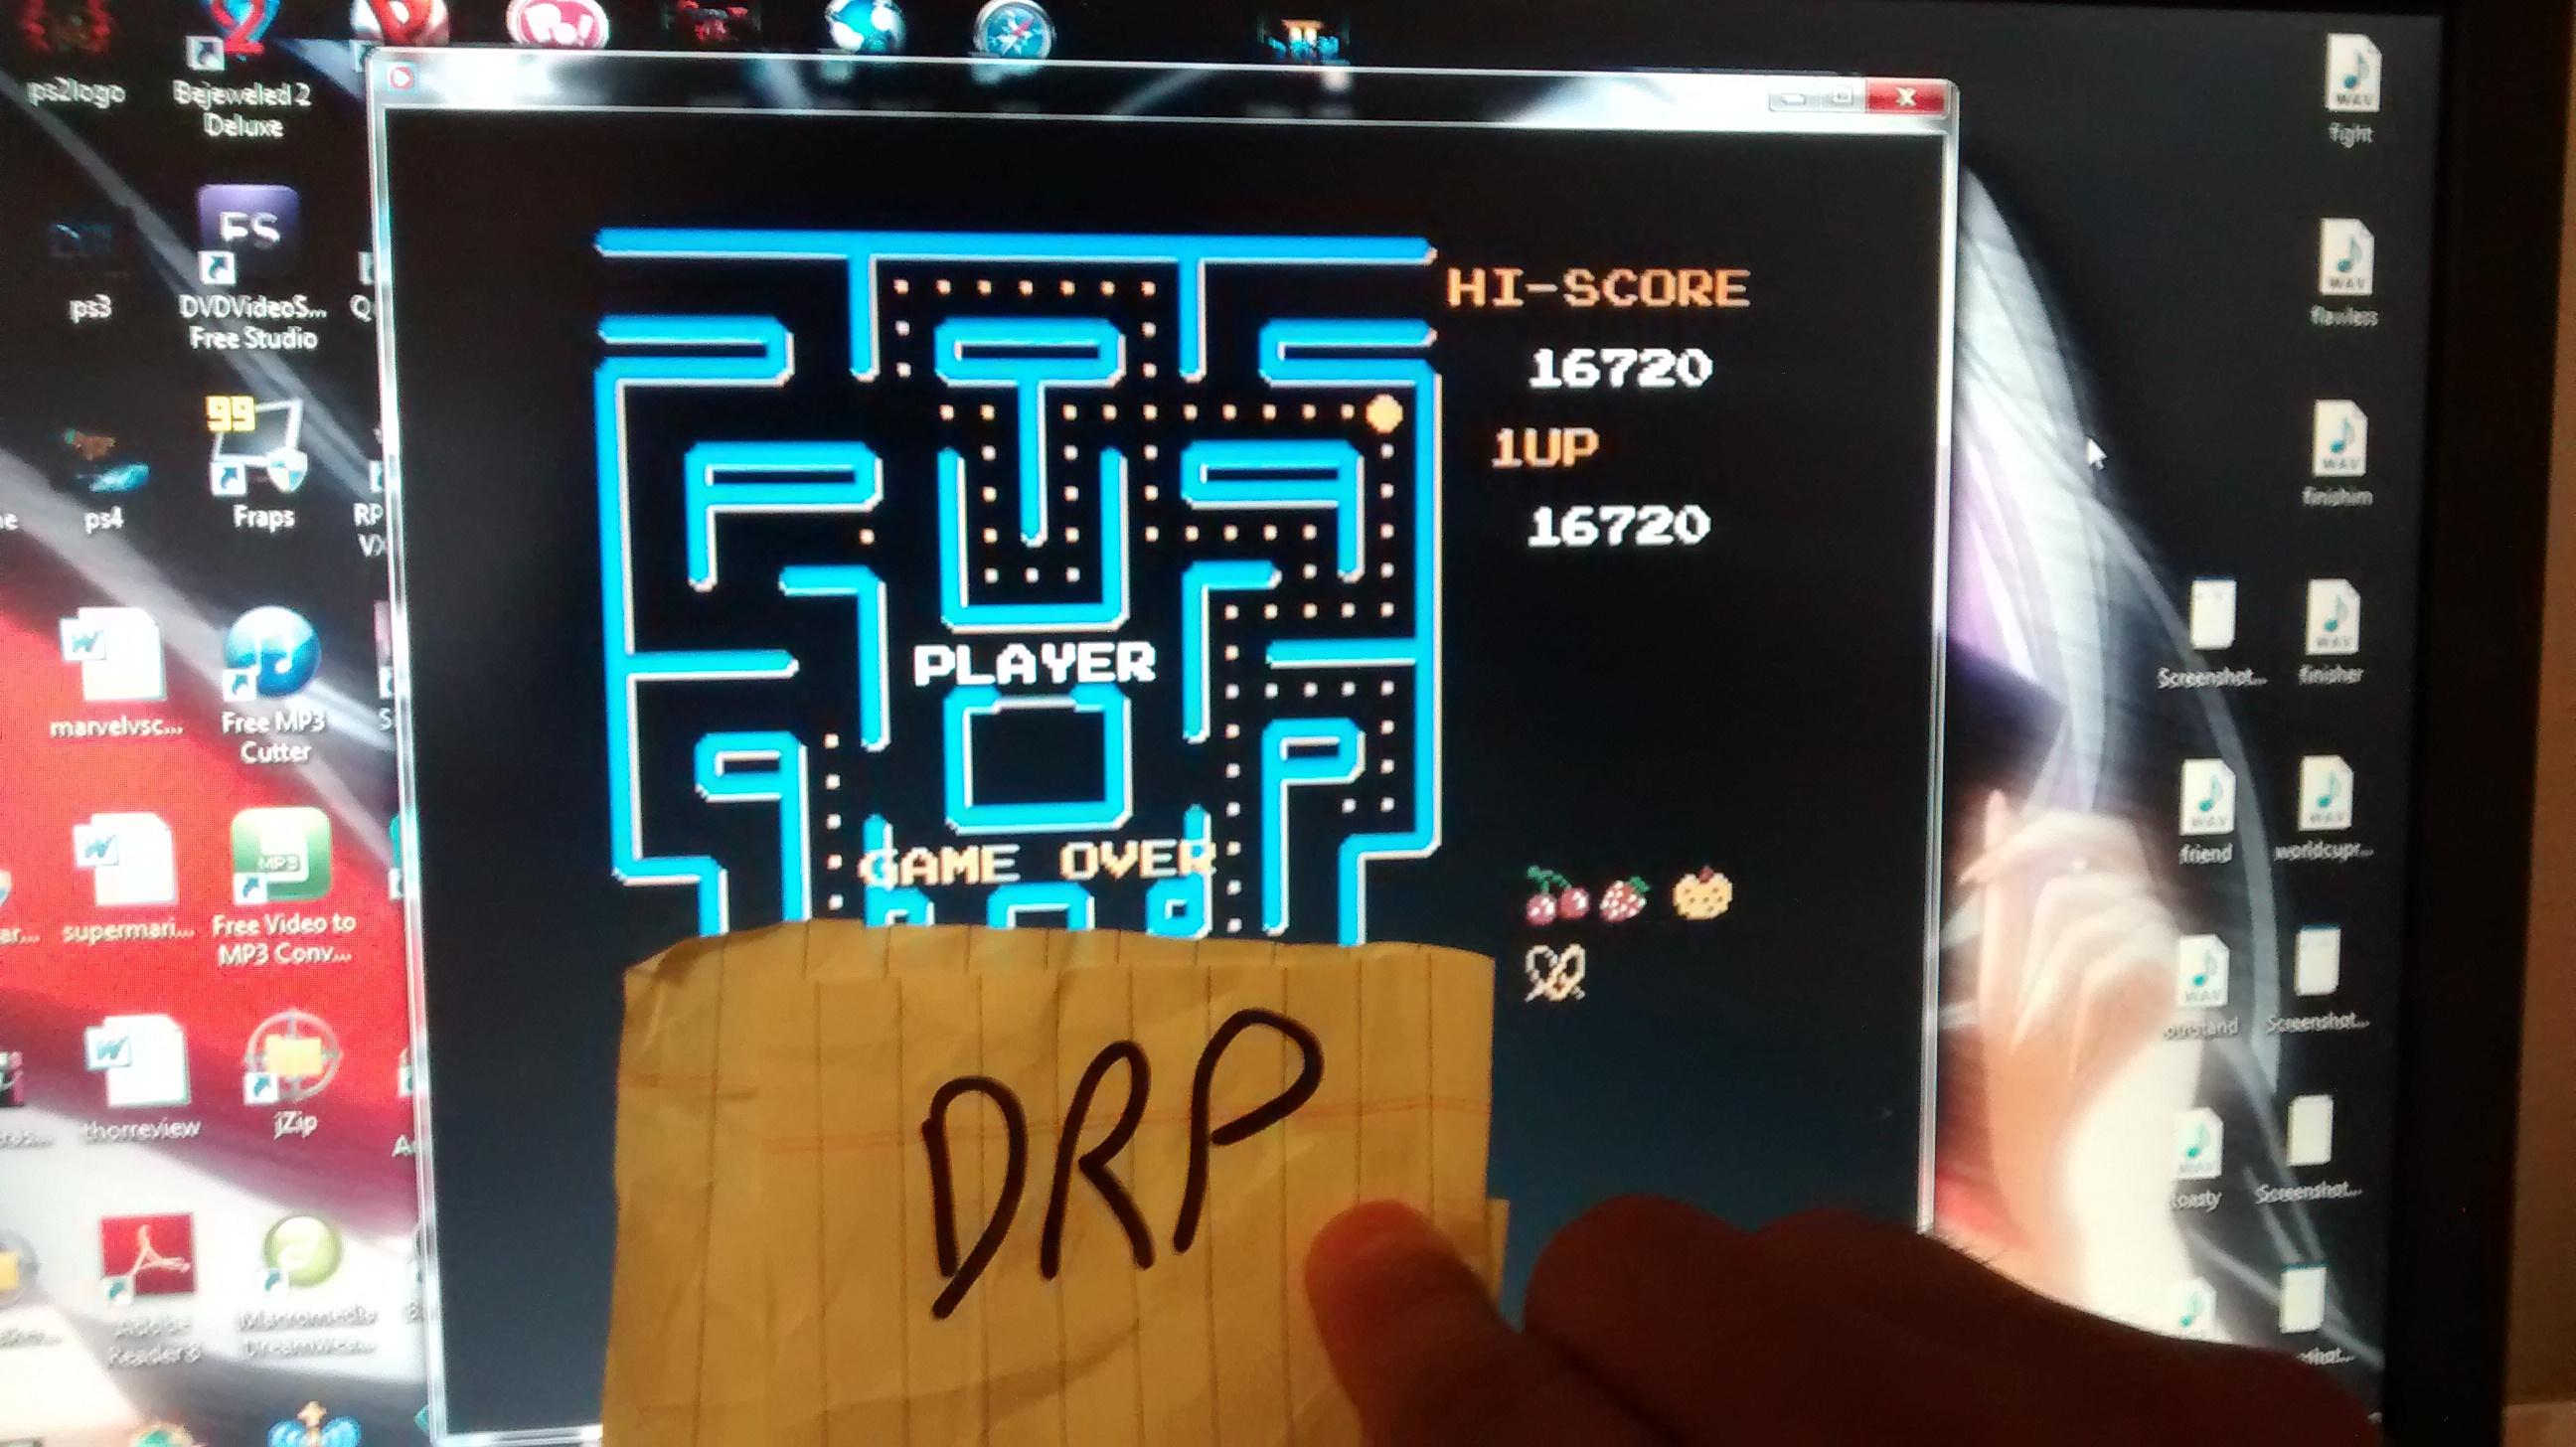 Ms. Pac-Man [Namco] 16,720 points